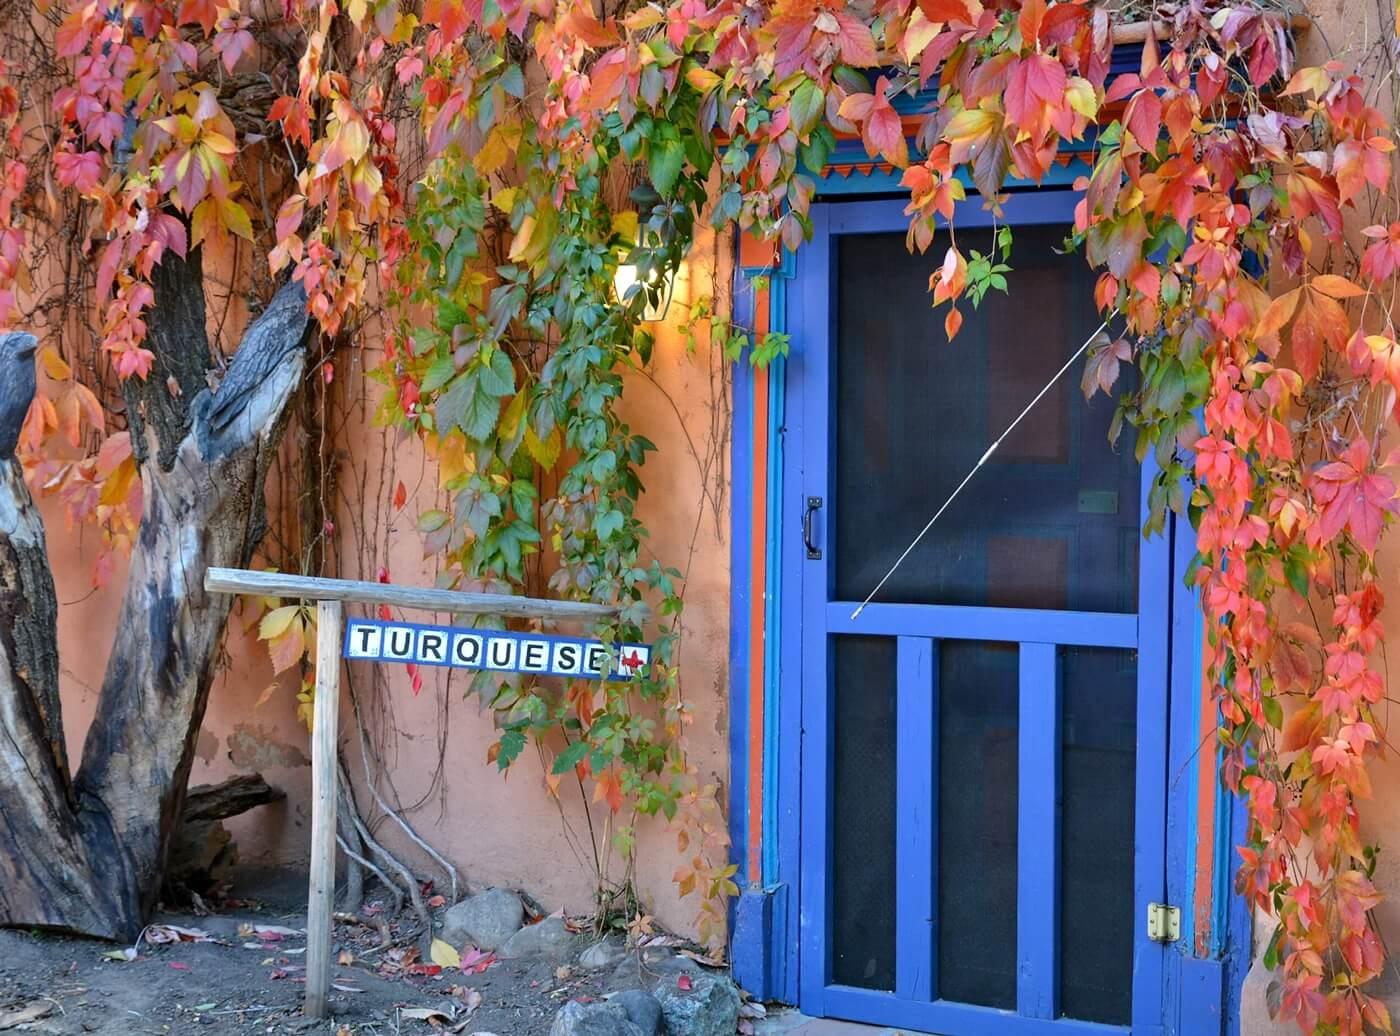 Puerta Turquesa entrance